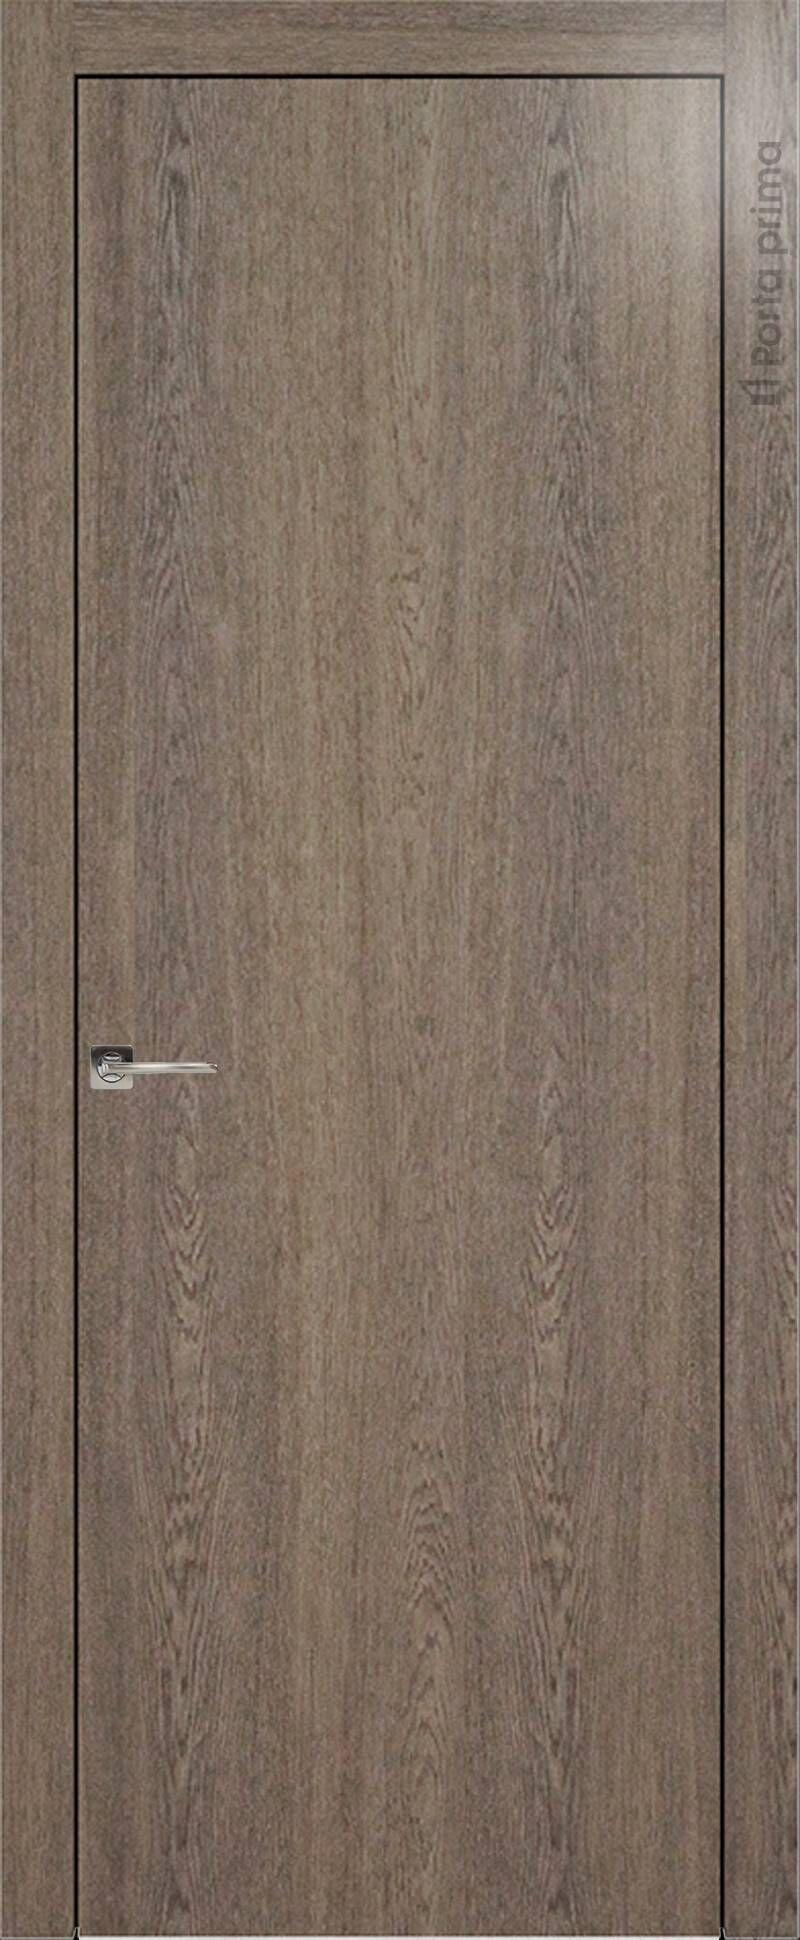 Tivoli А-1 цвет - Дуб антик Без стекла (ДГ)